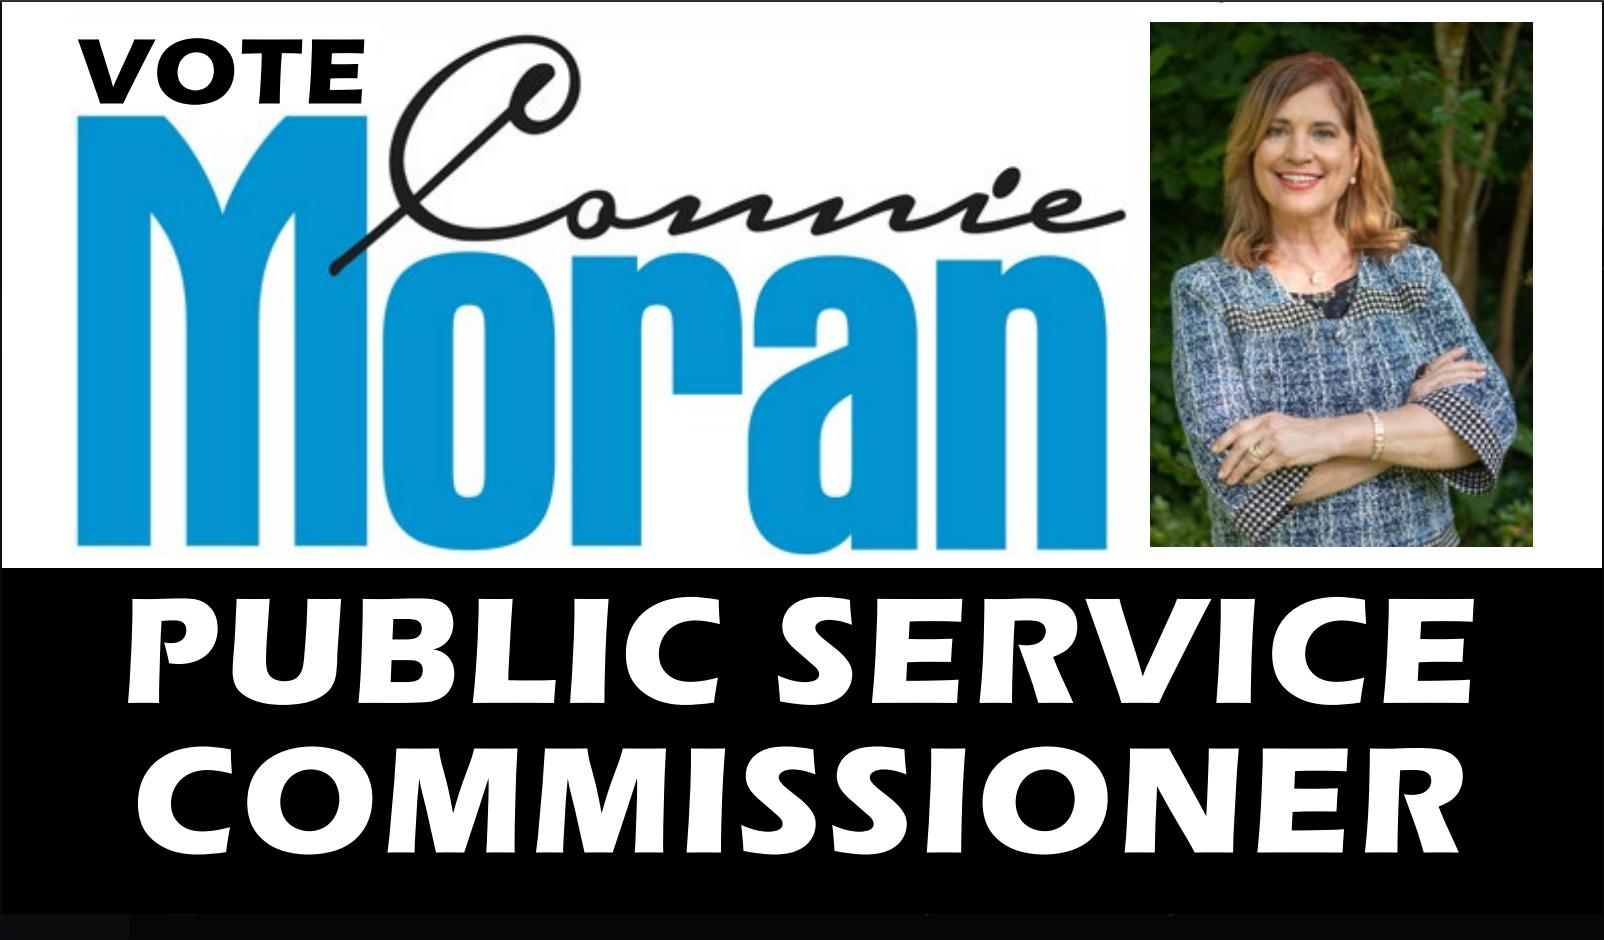 Connie Moran